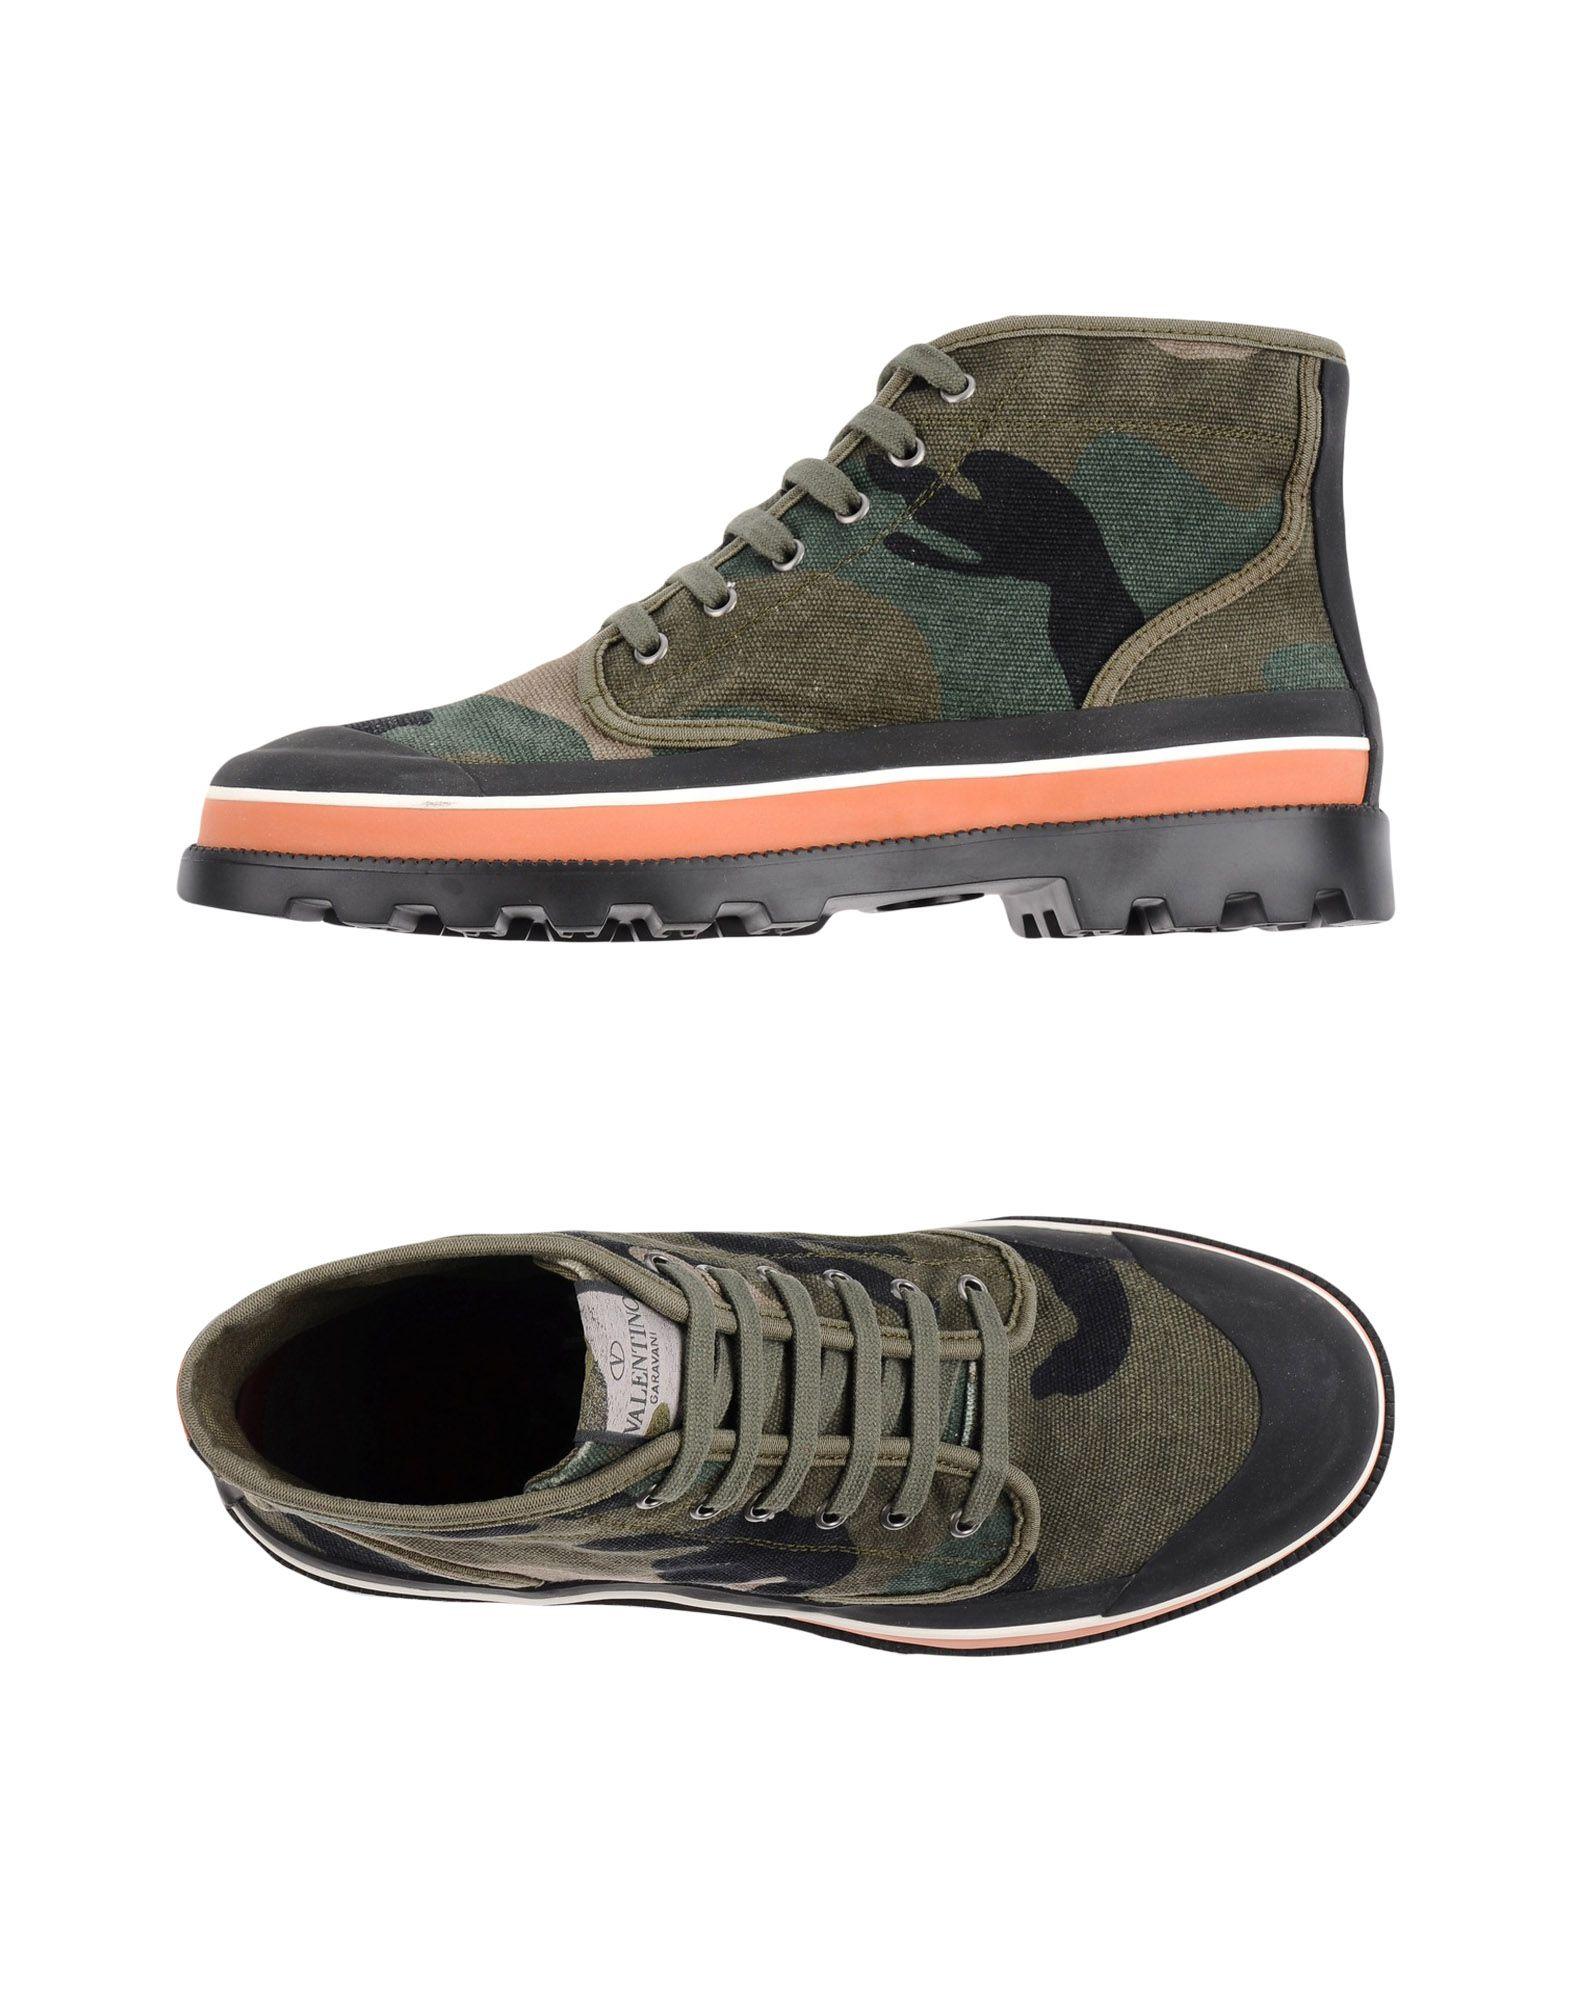 Valentino Garavani Gute Sneakers Herren  11343516SK Gute Garavani Qualität beliebte Schuhe 671f6e